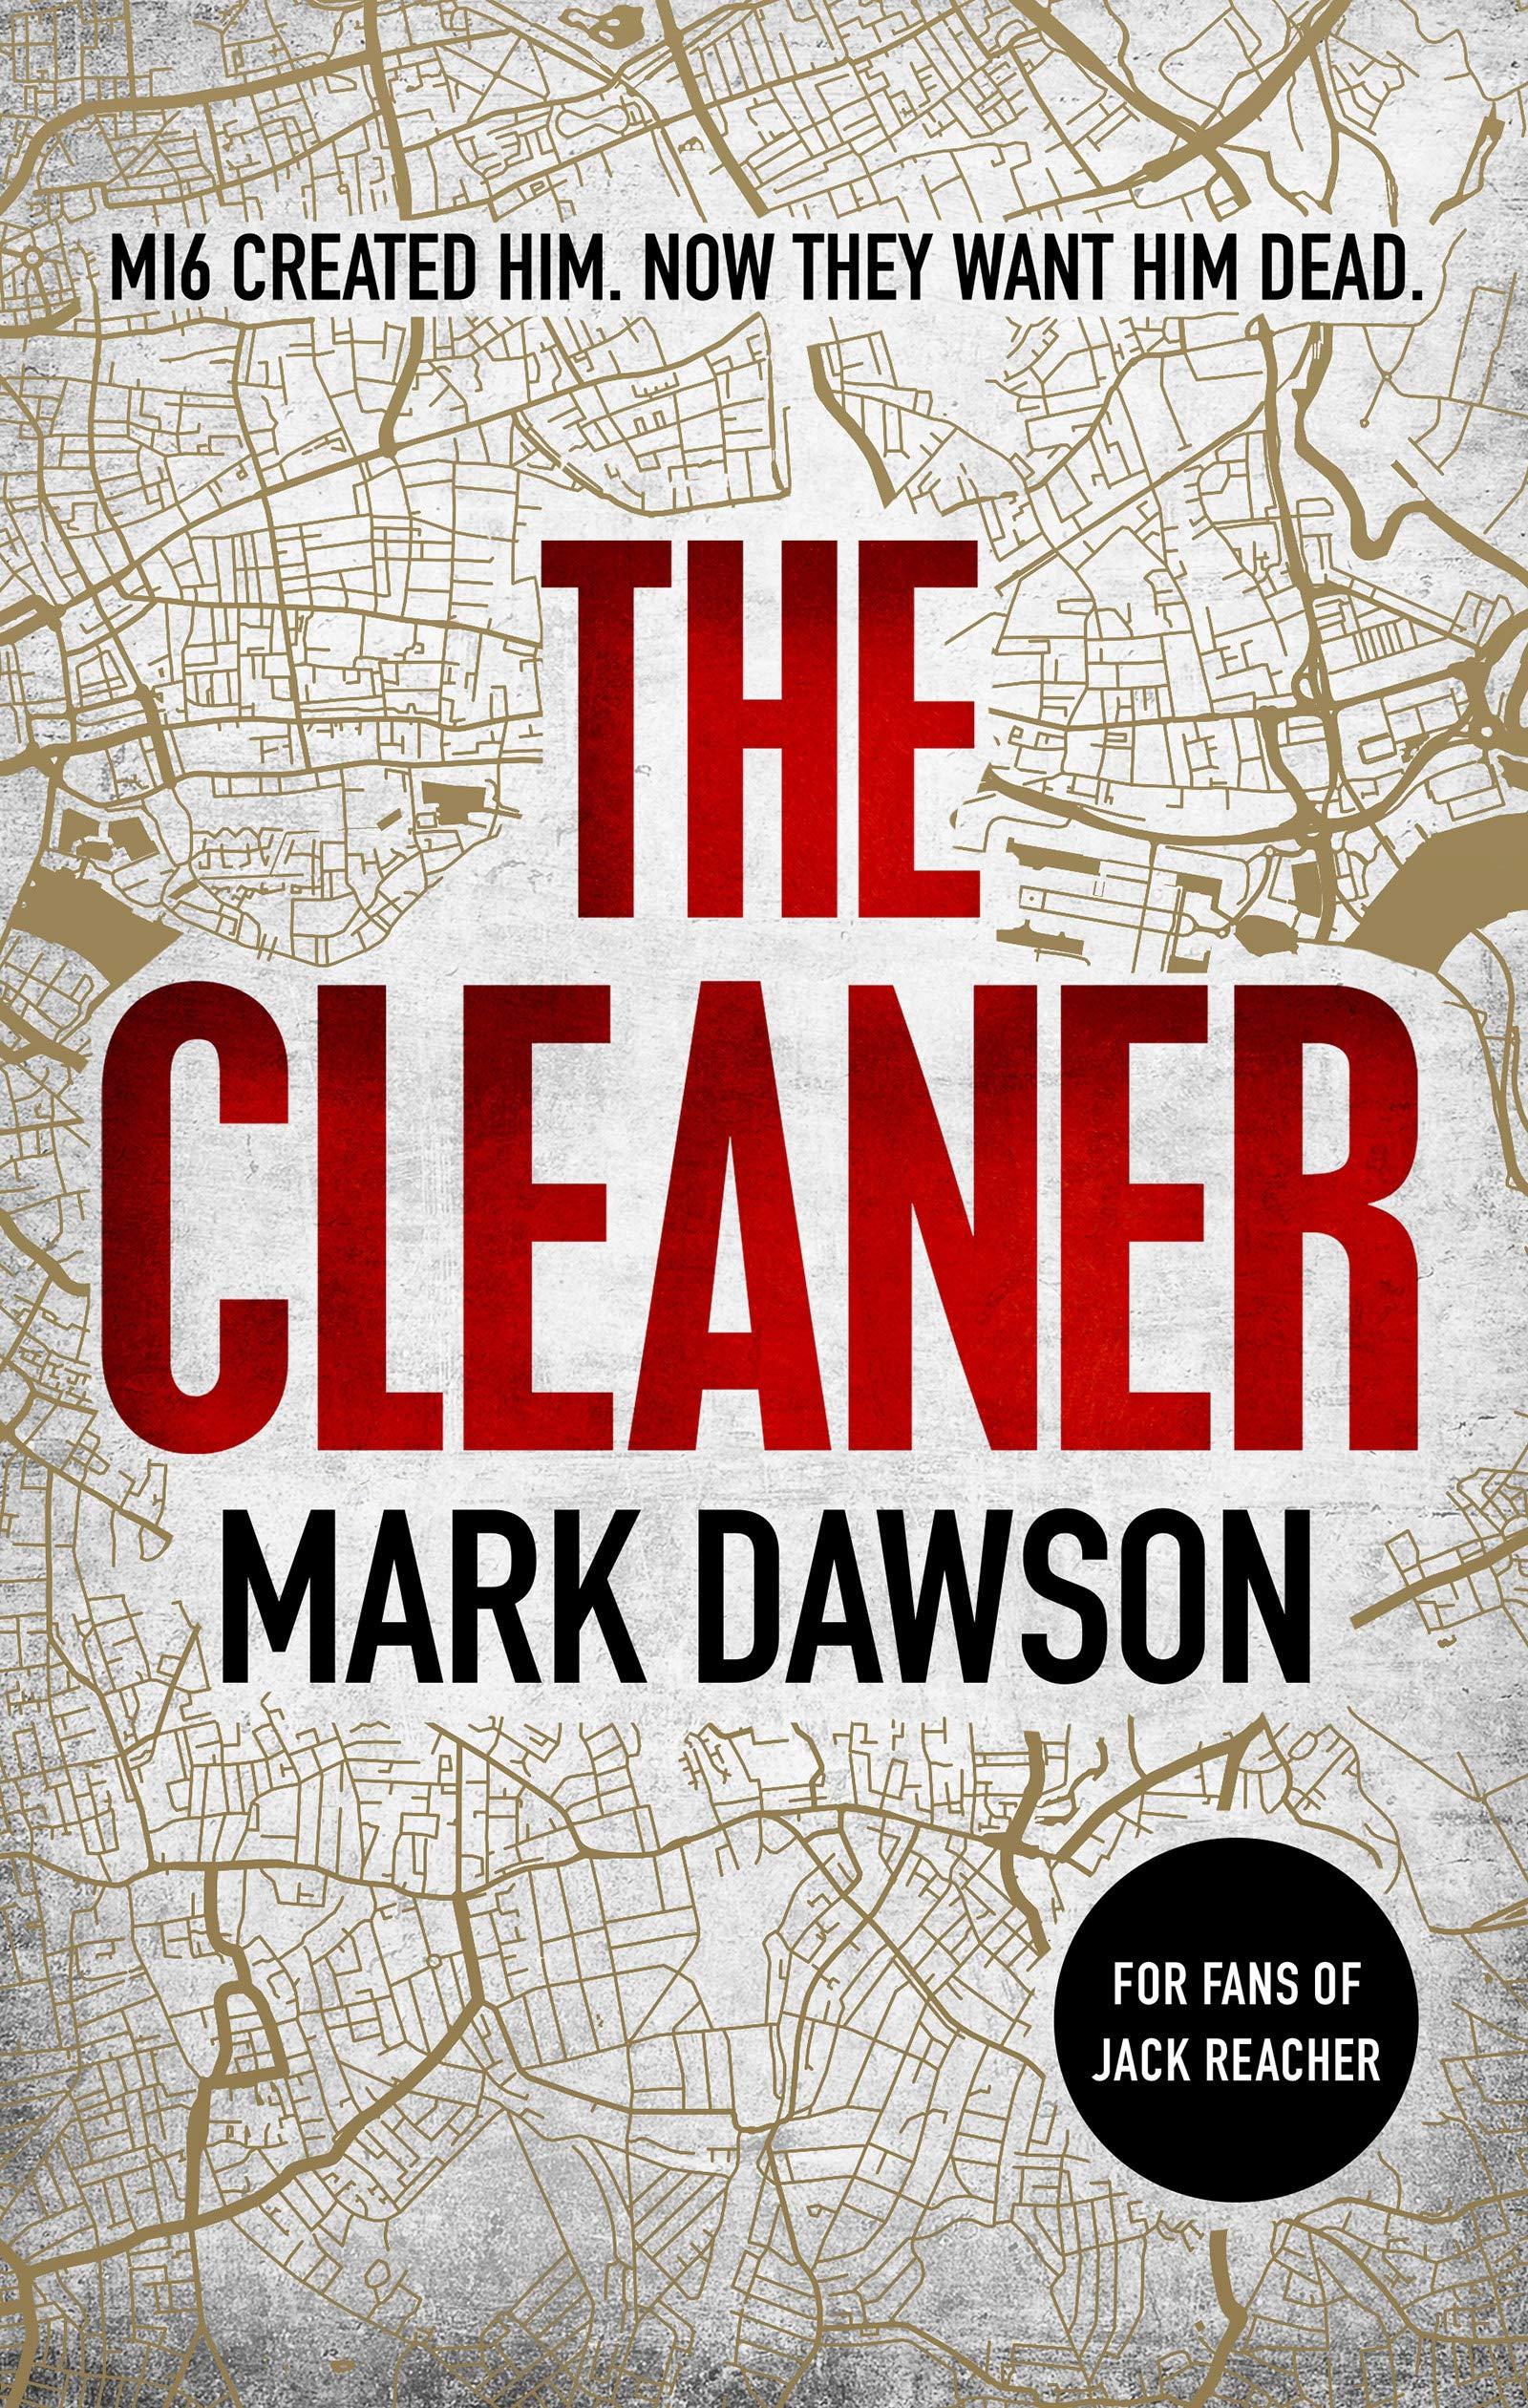 The Cleaner (John Milton): 9781787394711: Books - Amazon.ca